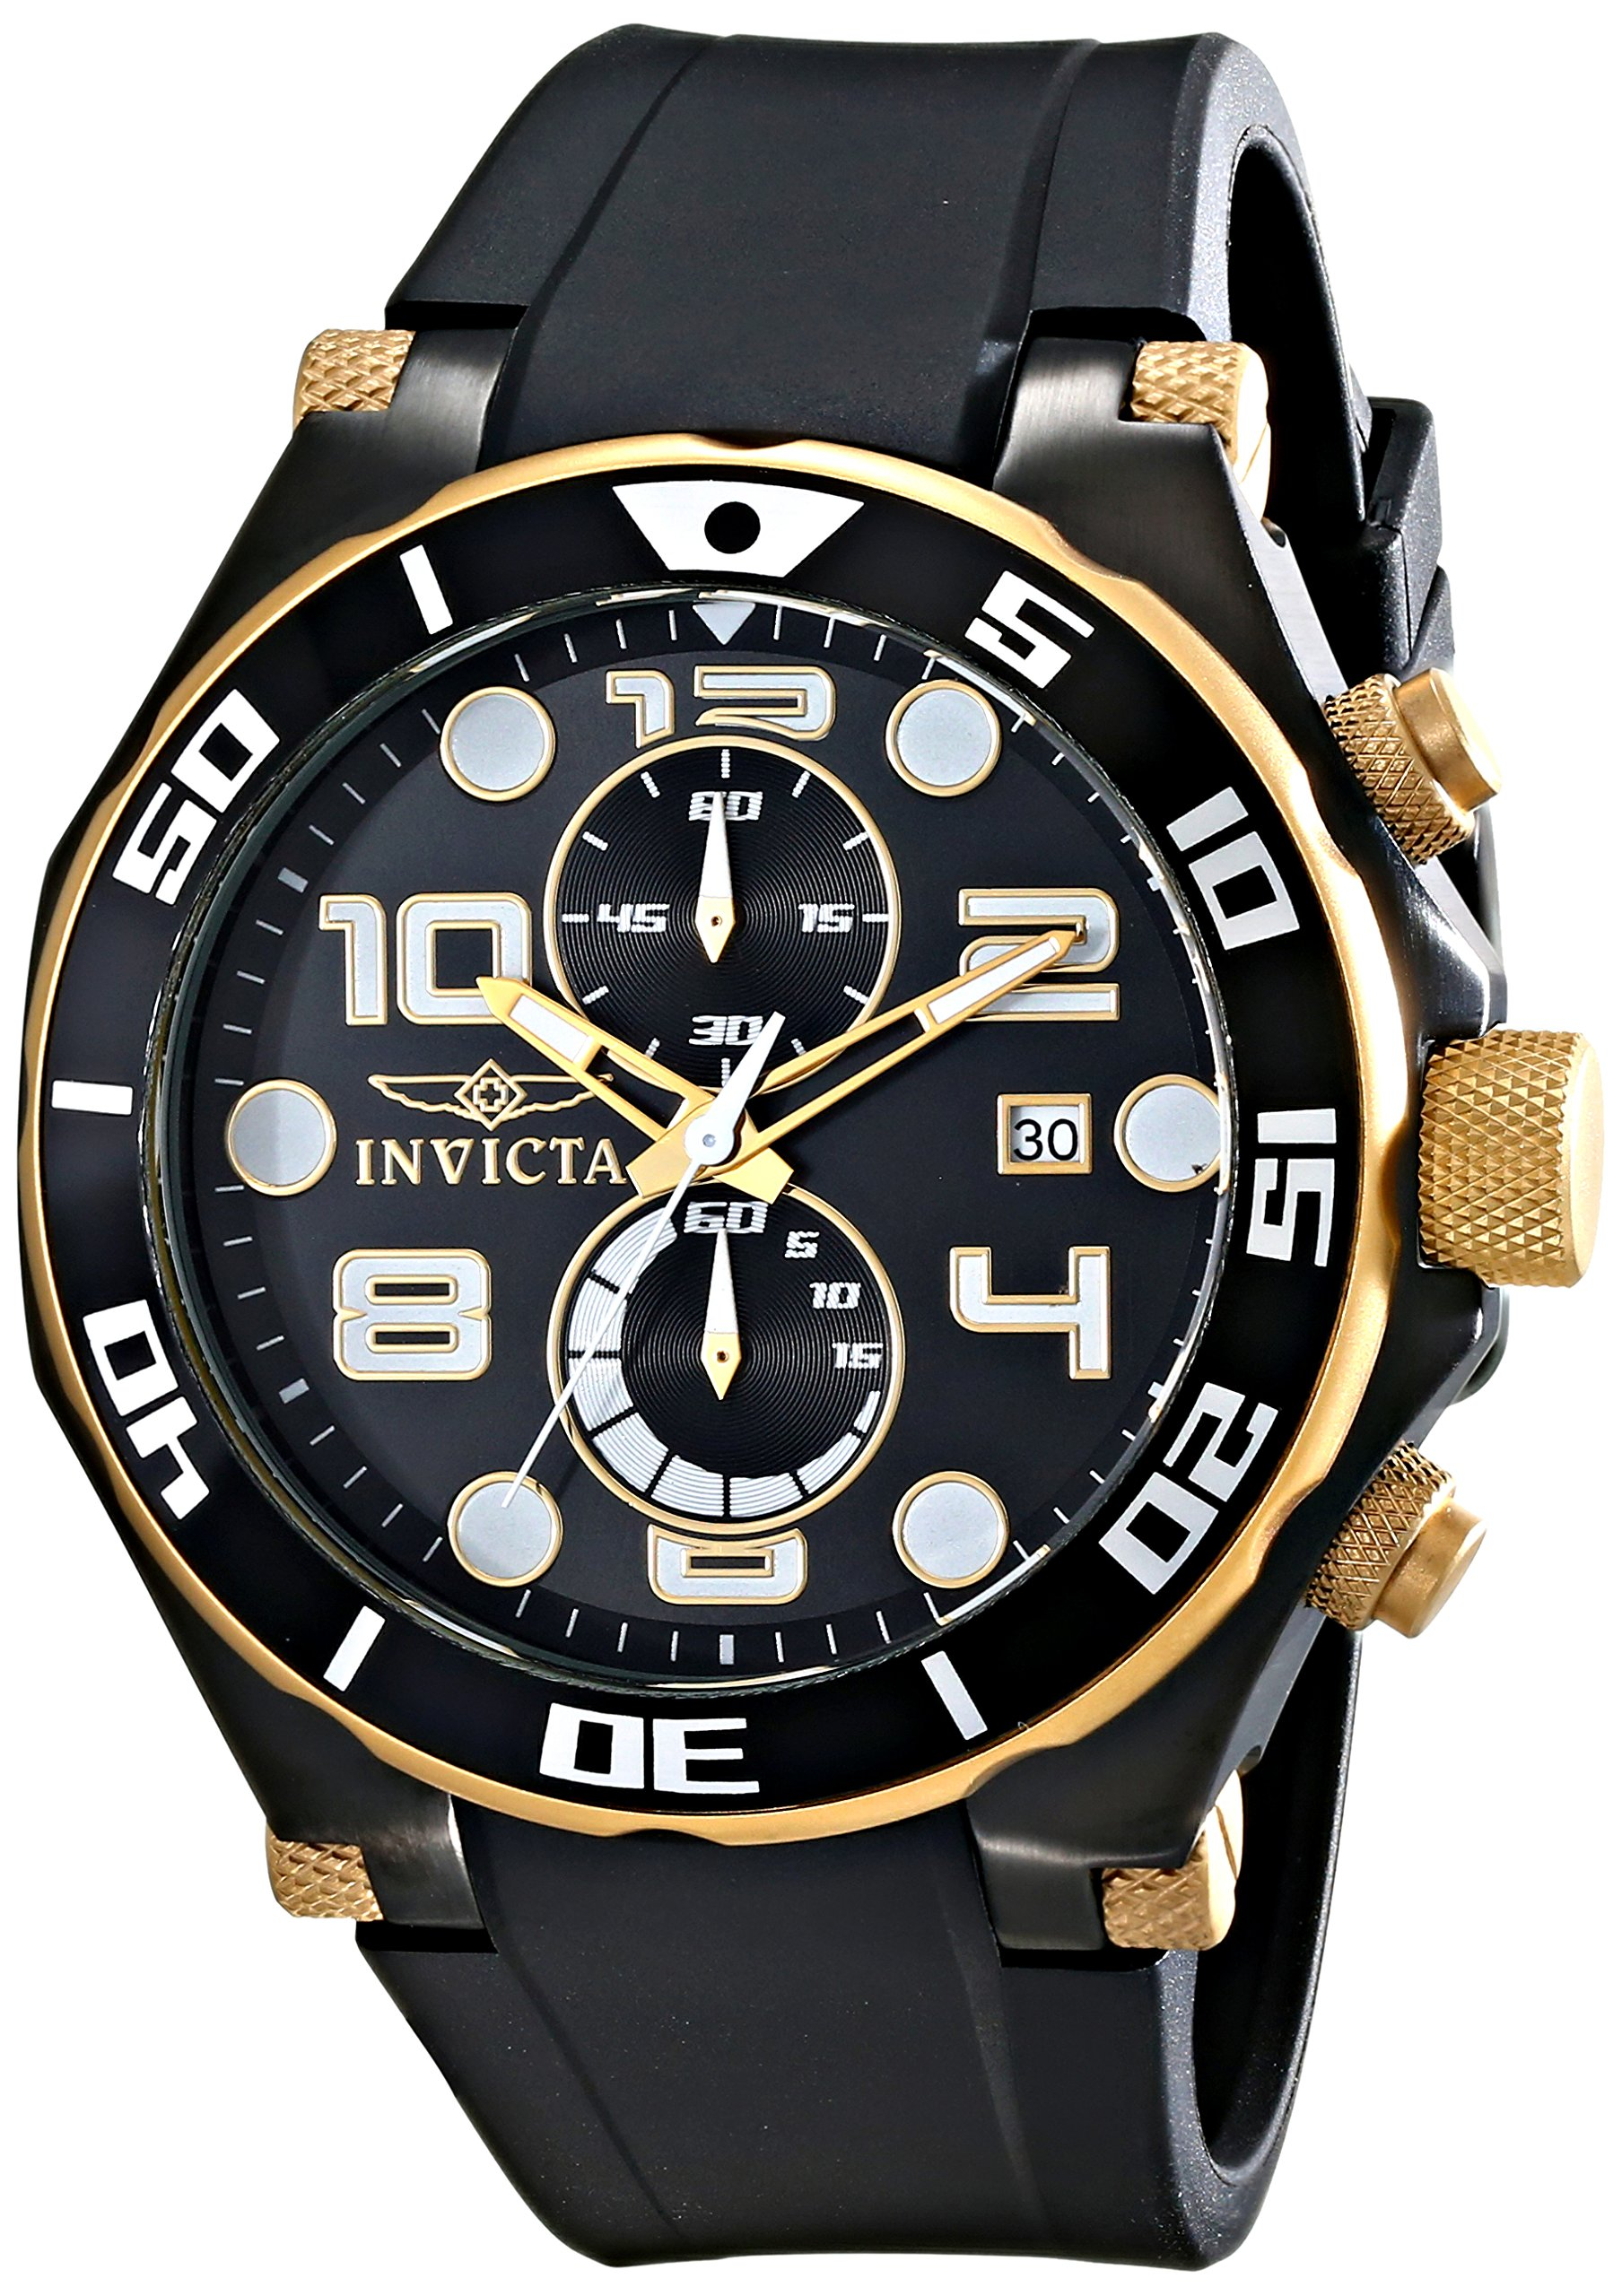 Invicta Men's 15396 Pro Diver Analog Display Quartz Black Watch